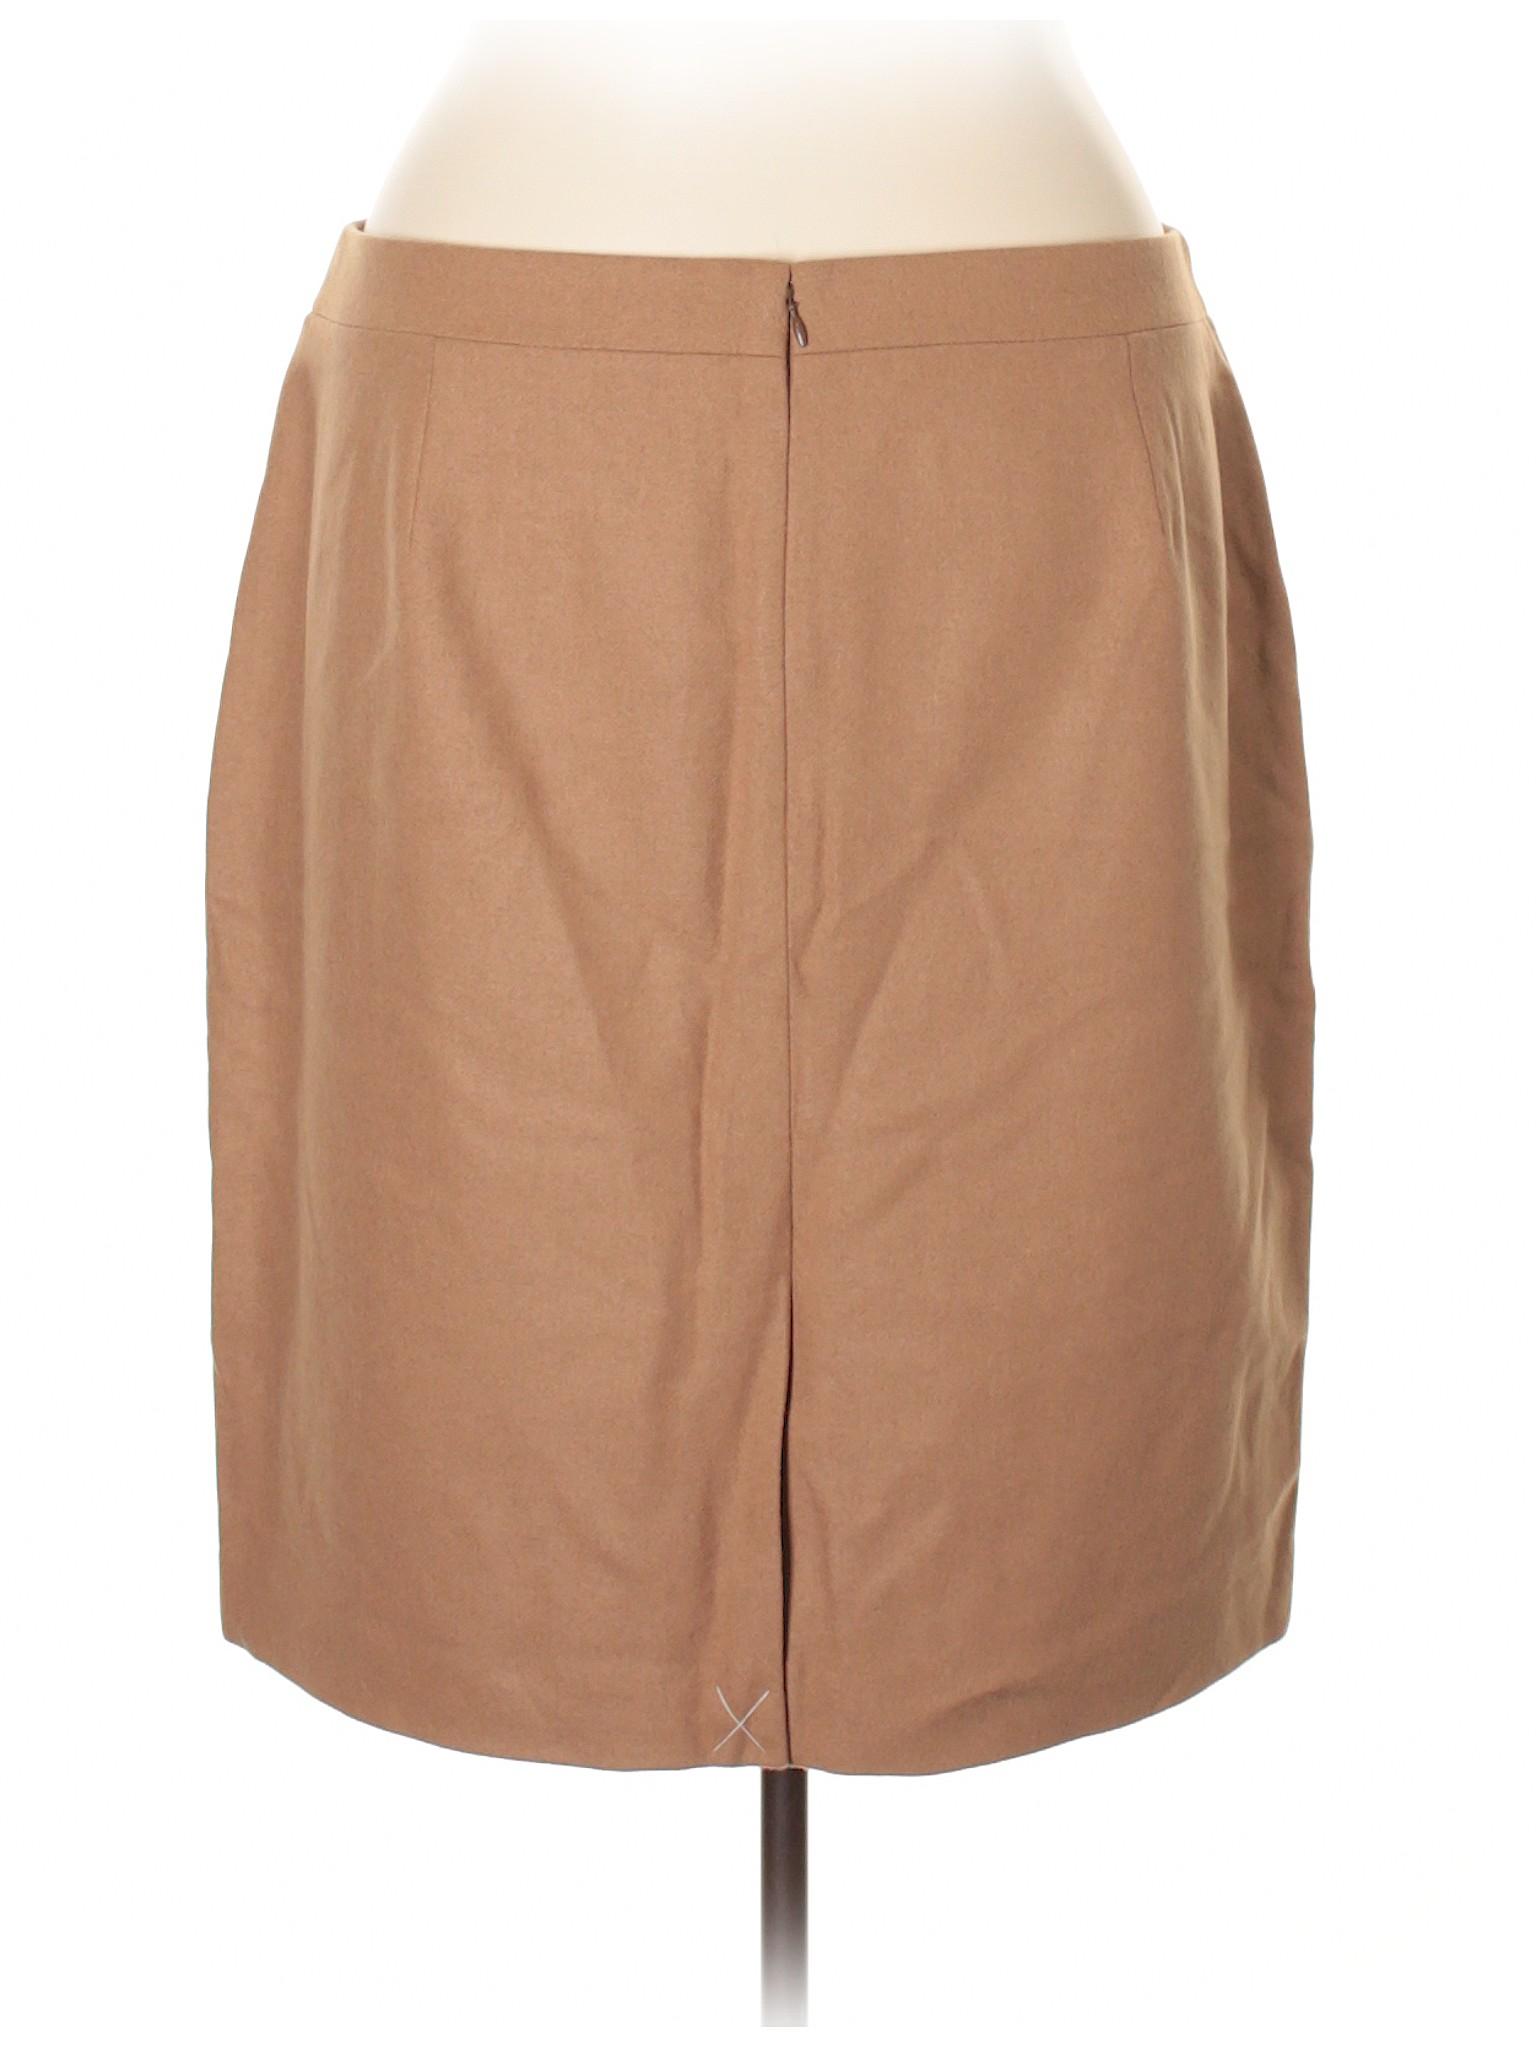 Boutique J Skirt Wool Crew Skirt J Boutique Wool Crew Xqx84IR4